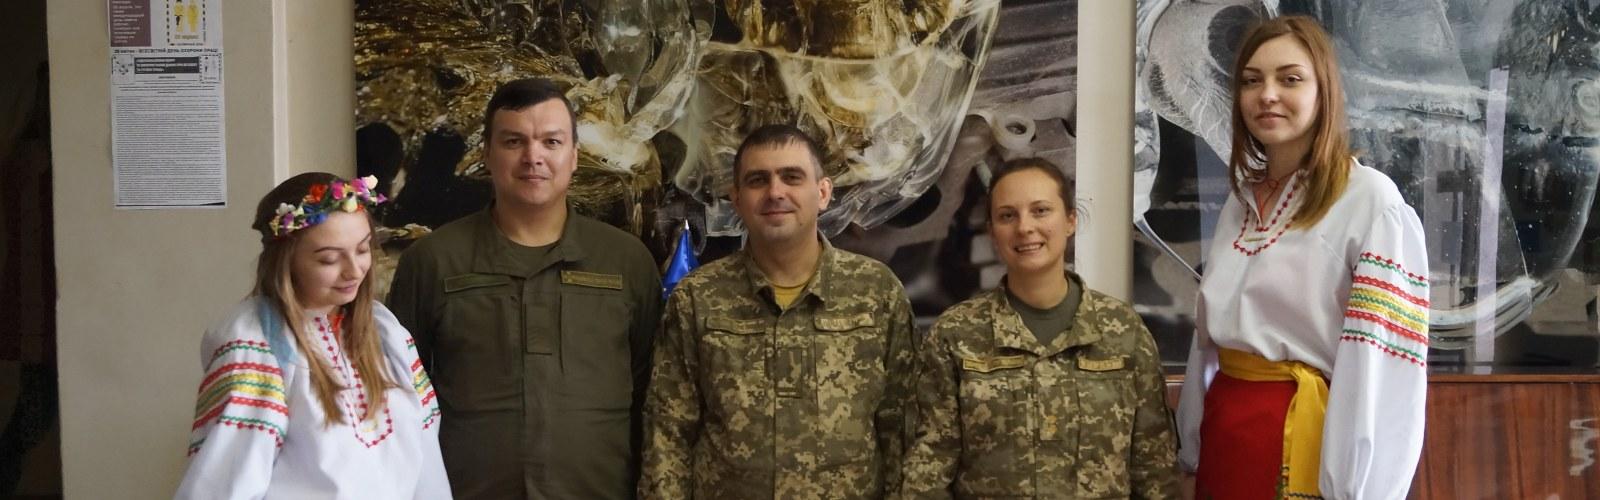 День захисника України у ПДТУ